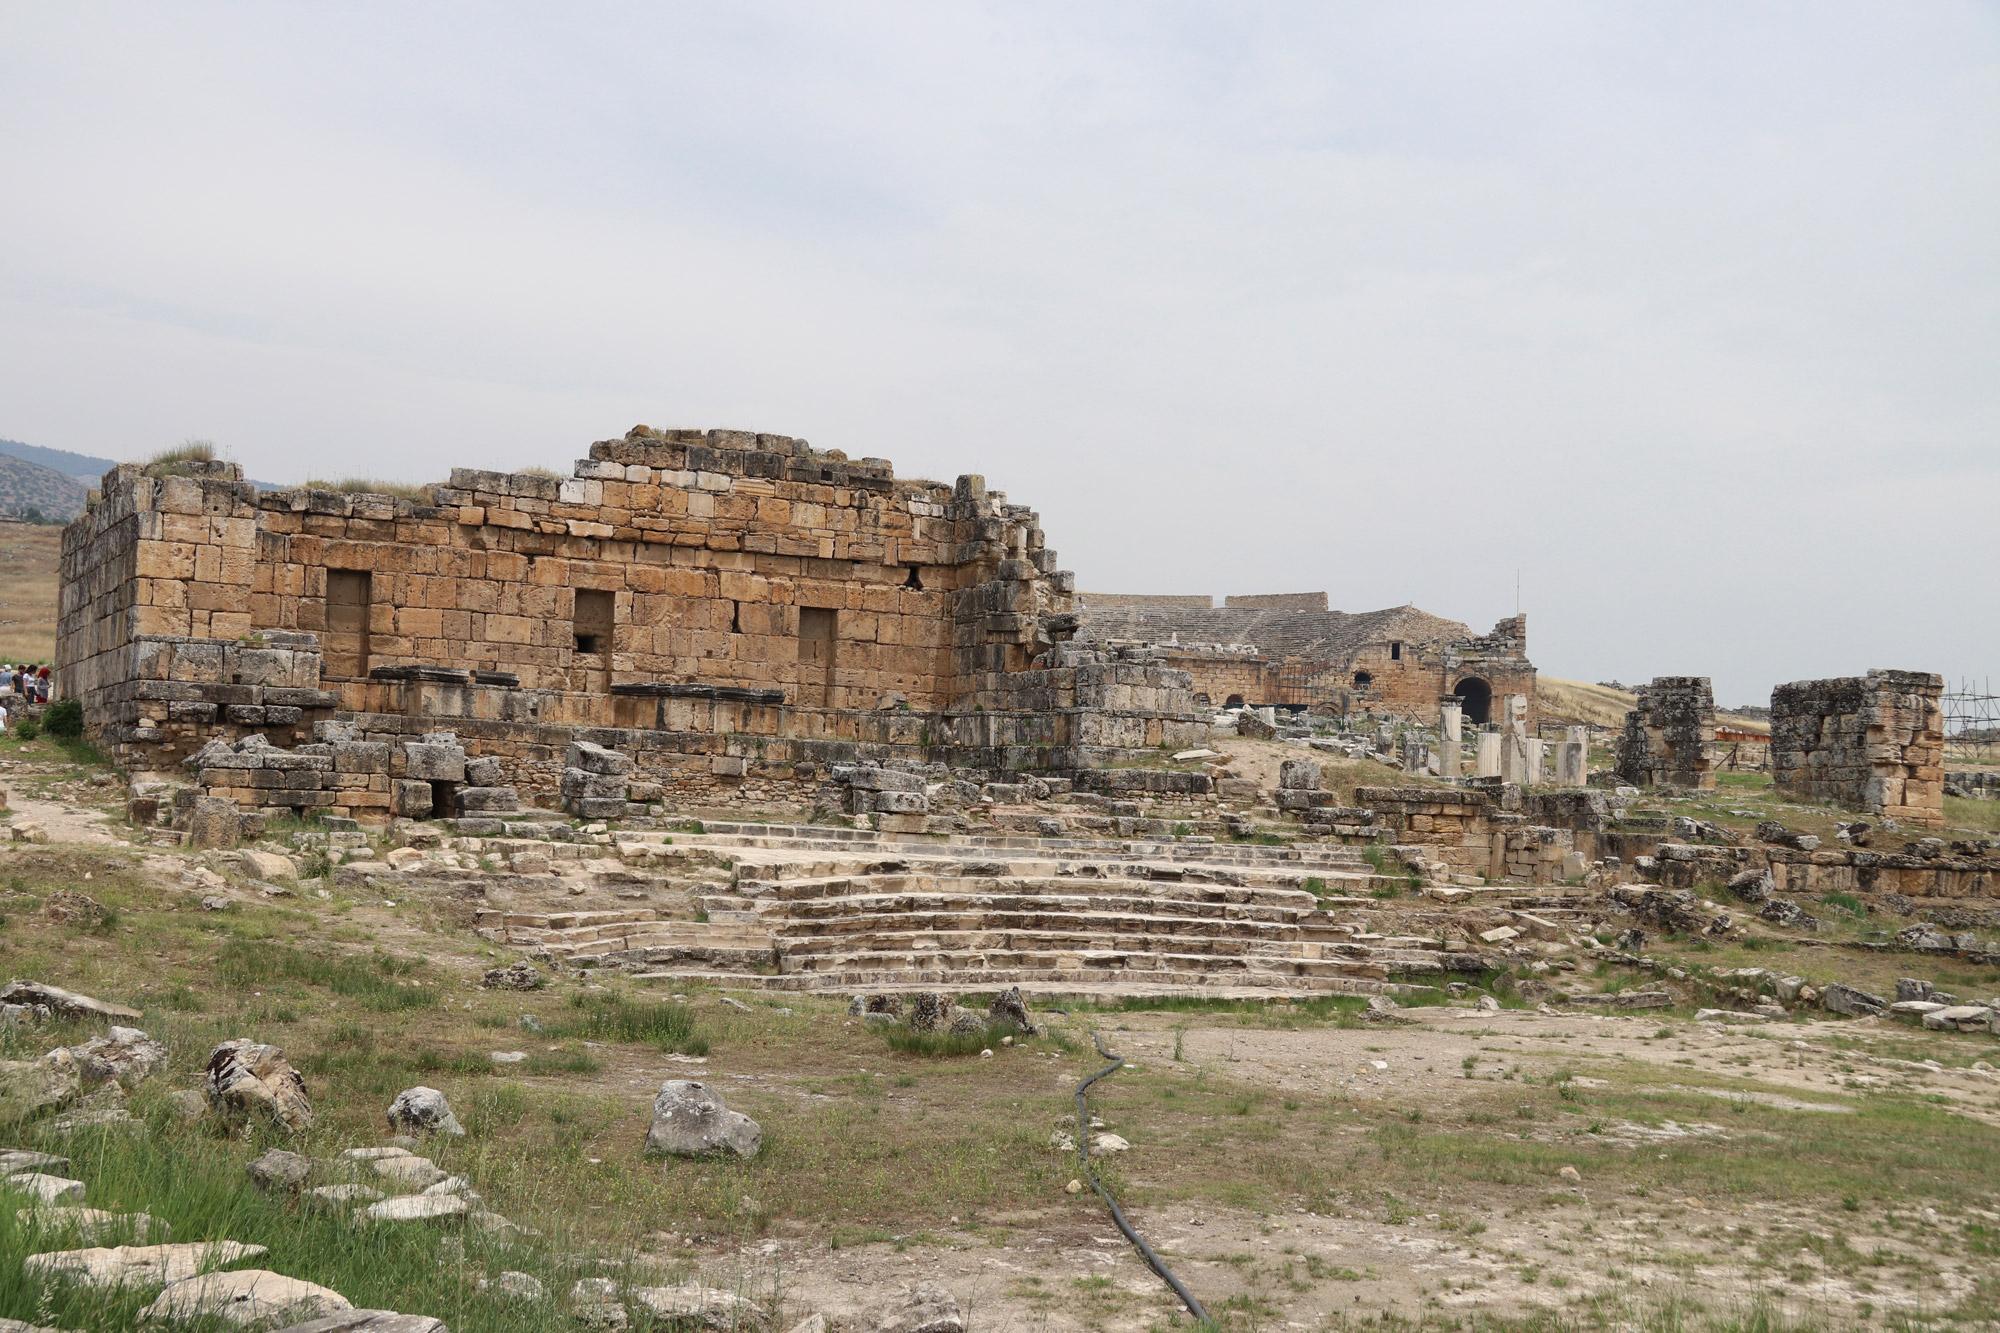 Turkije reisverslag: Pamukkale en Hiërapolis - Nymphaeum